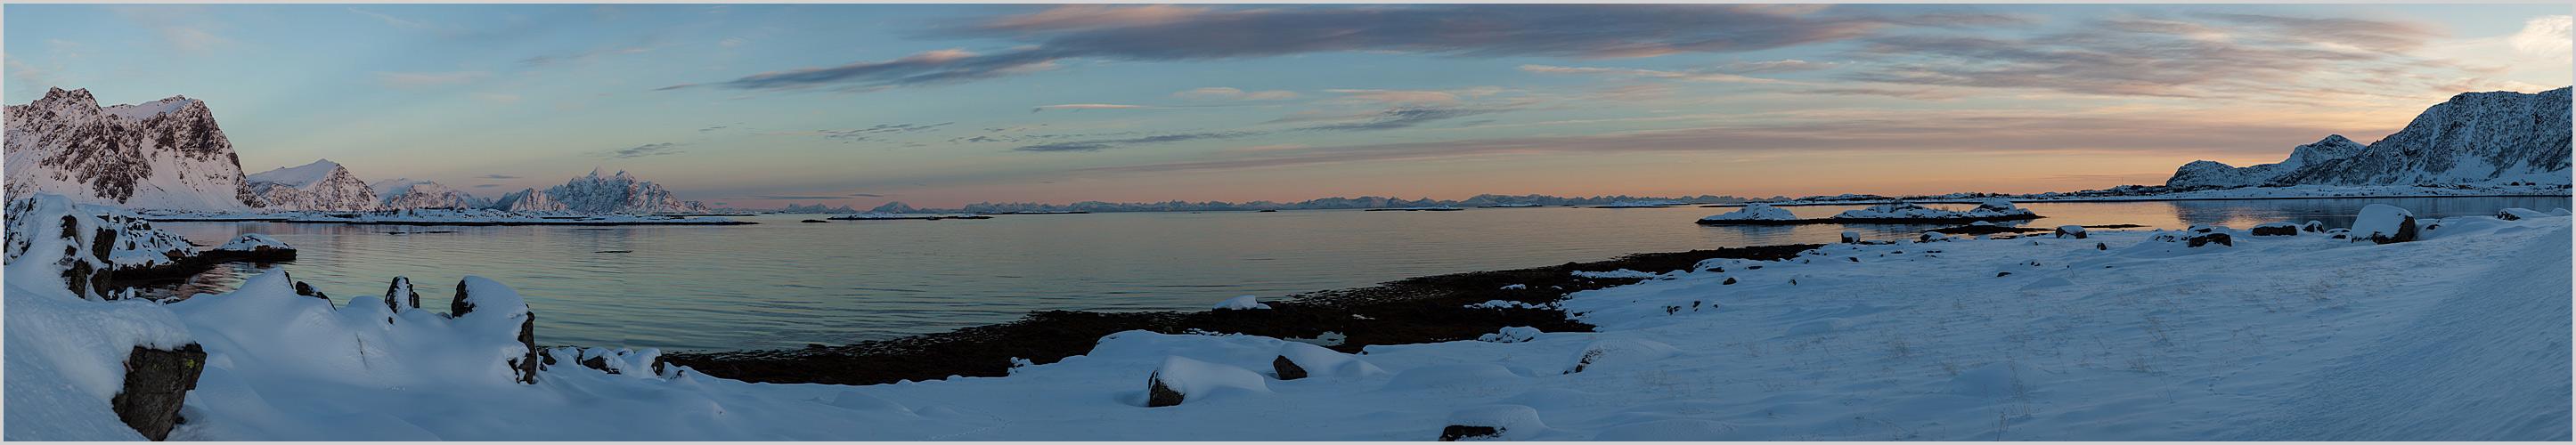 Valberg Sunset